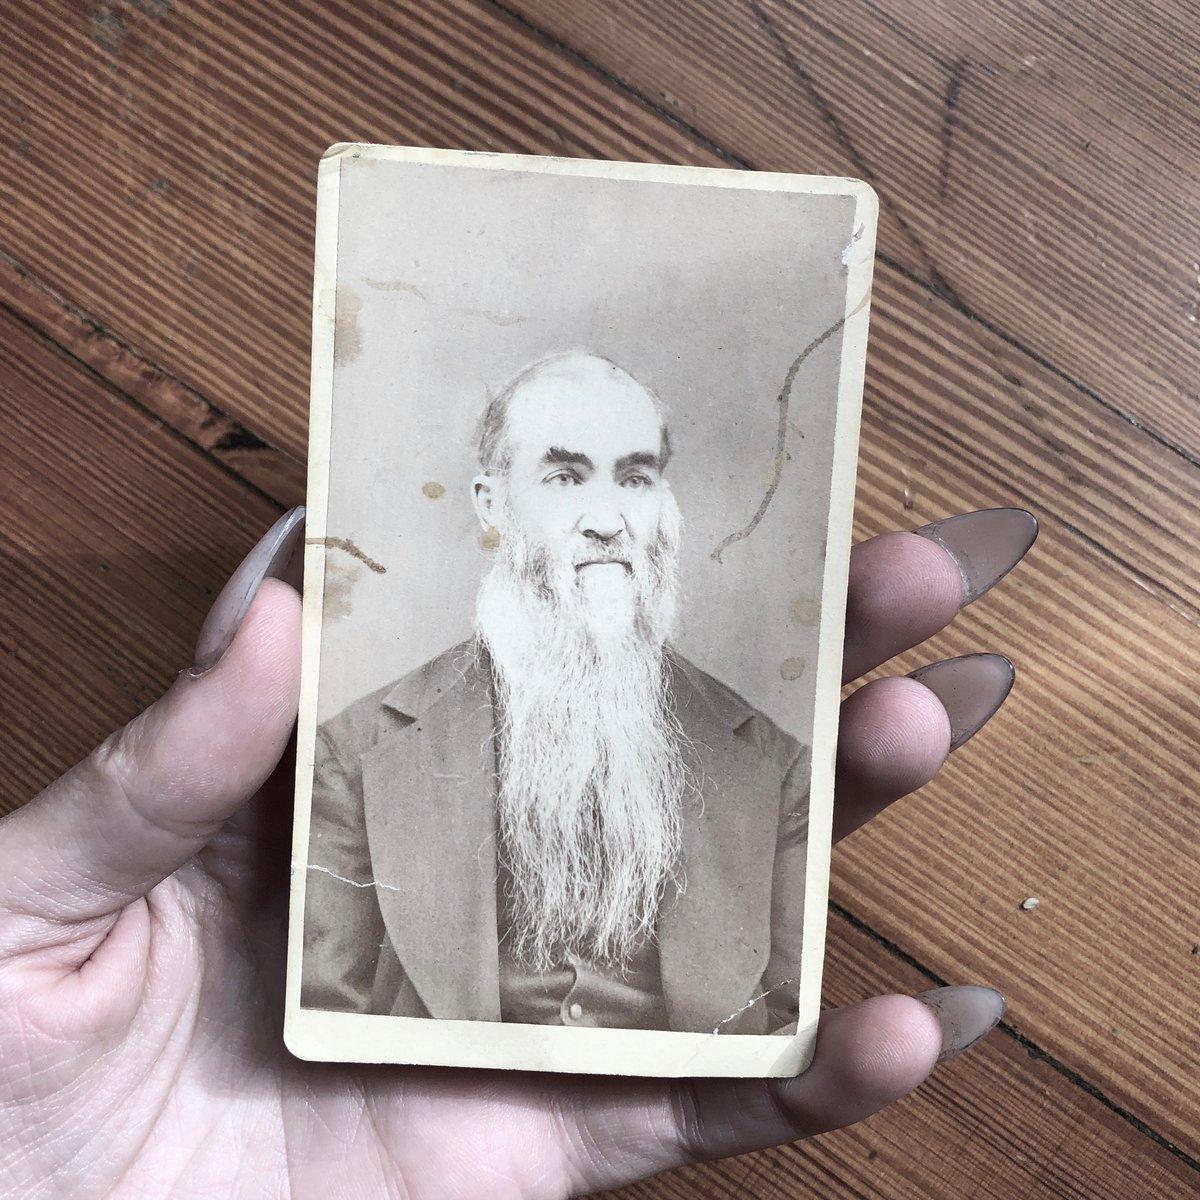 Image of Ol' Long Beard